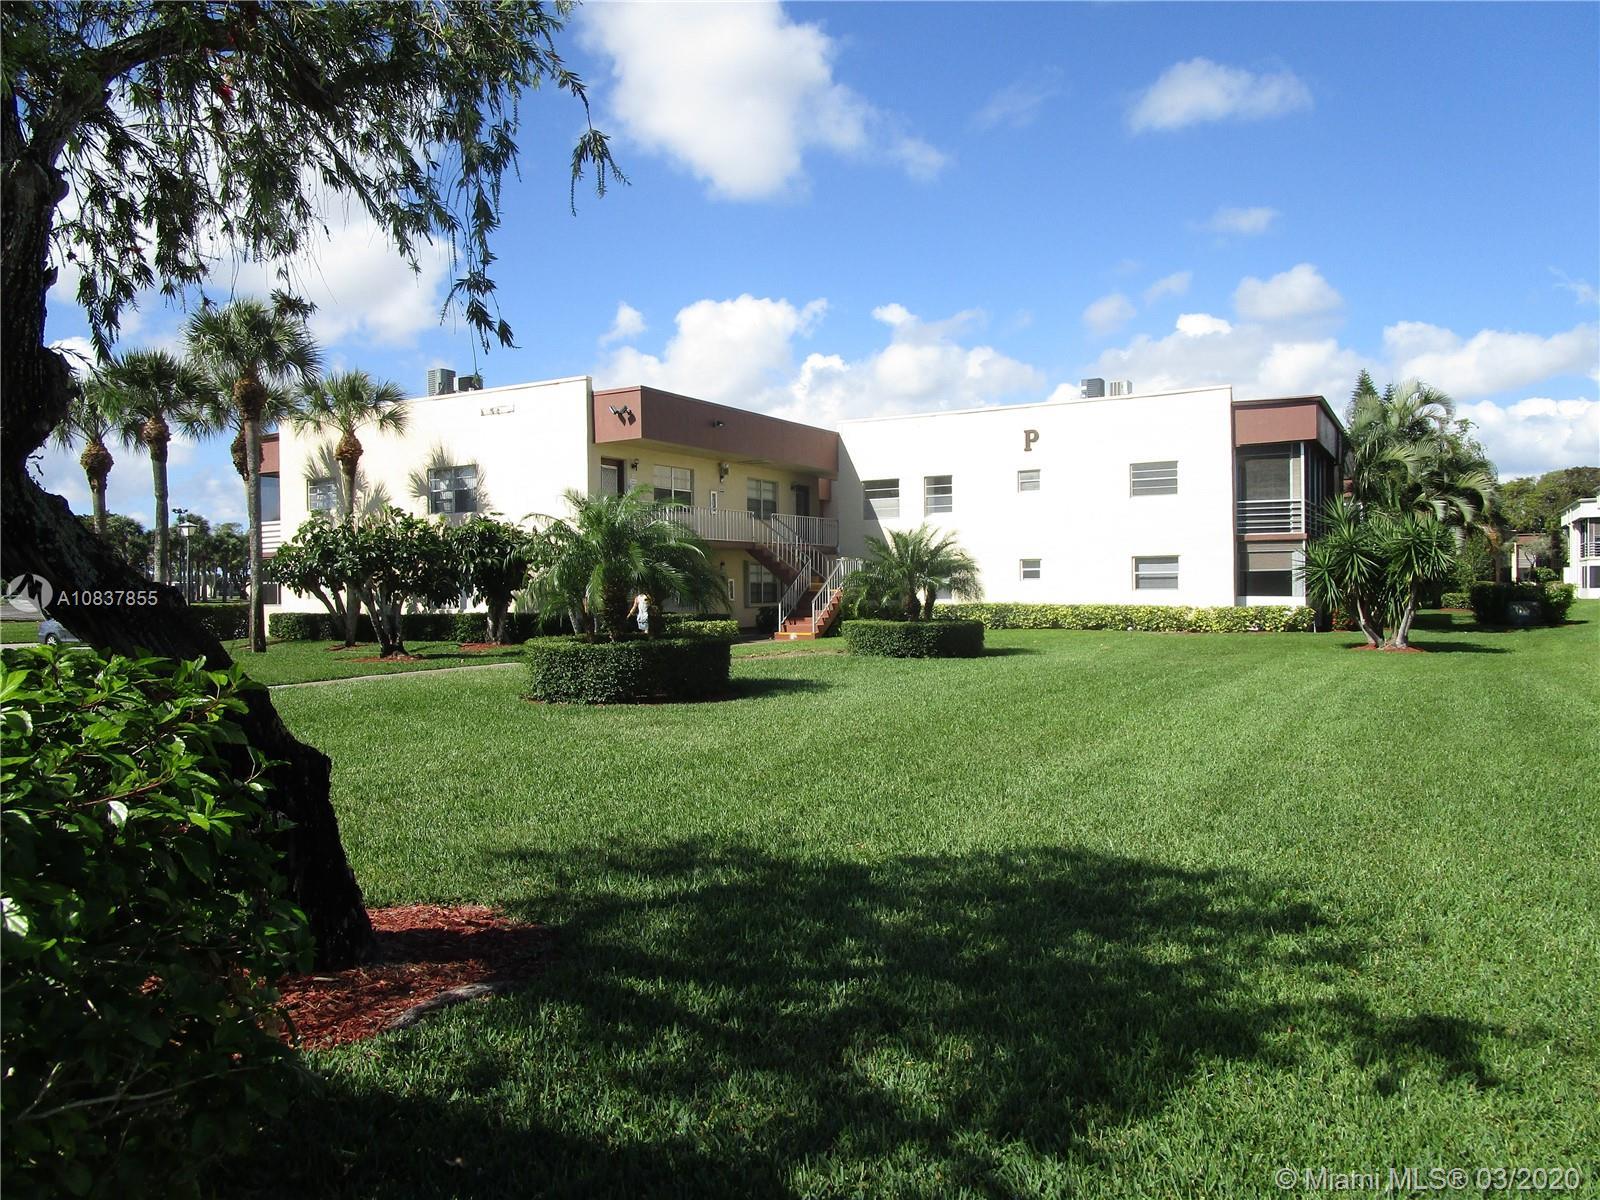 766 Normandy BLDG P # 766, Delray Beach, Florida 33484, 2 Bedrooms Bedrooms, ,2 BathroomsBathrooms,Residential,For Sale,766 Normandy BLDG P # 766,A10837855